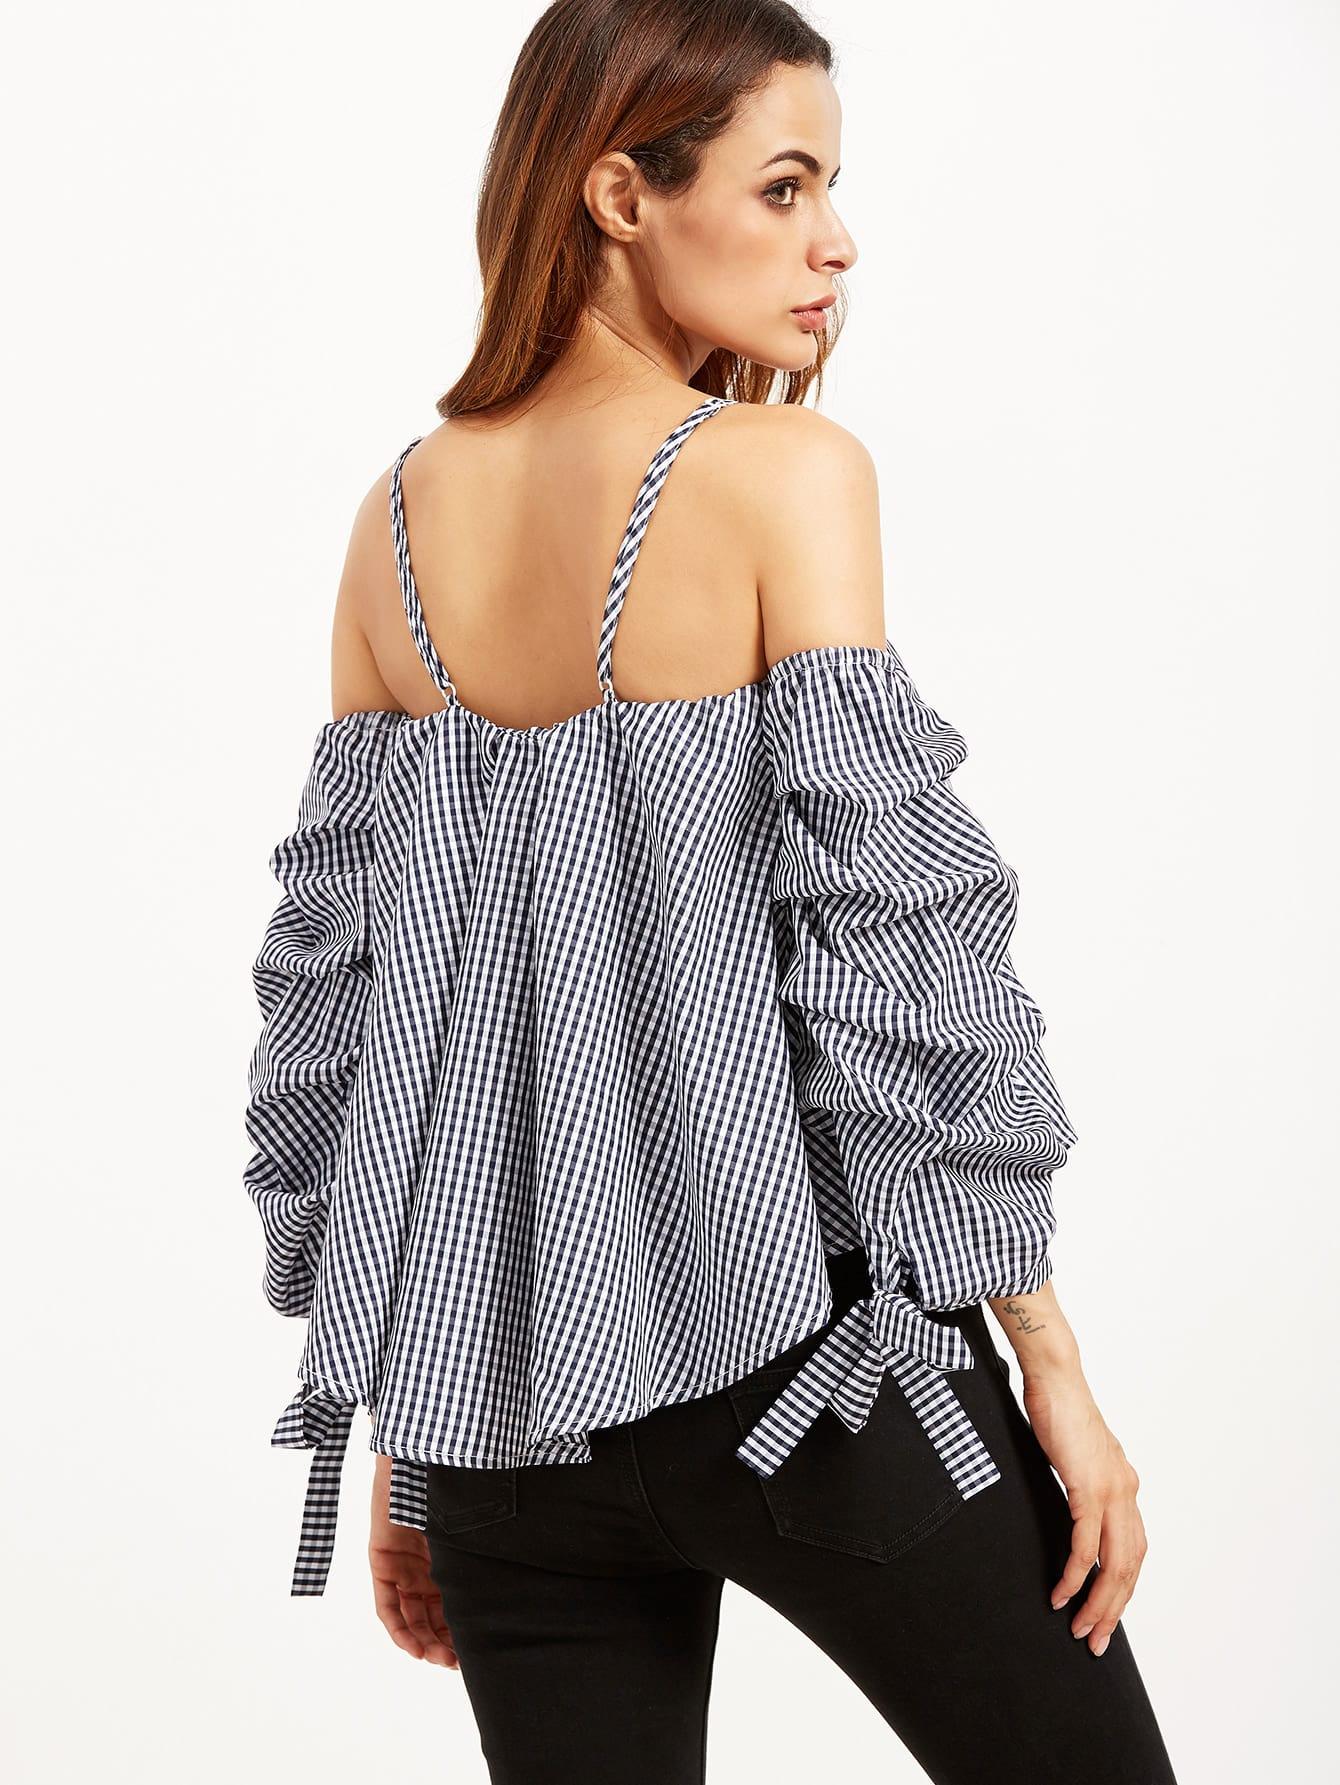 blouse160905501_2